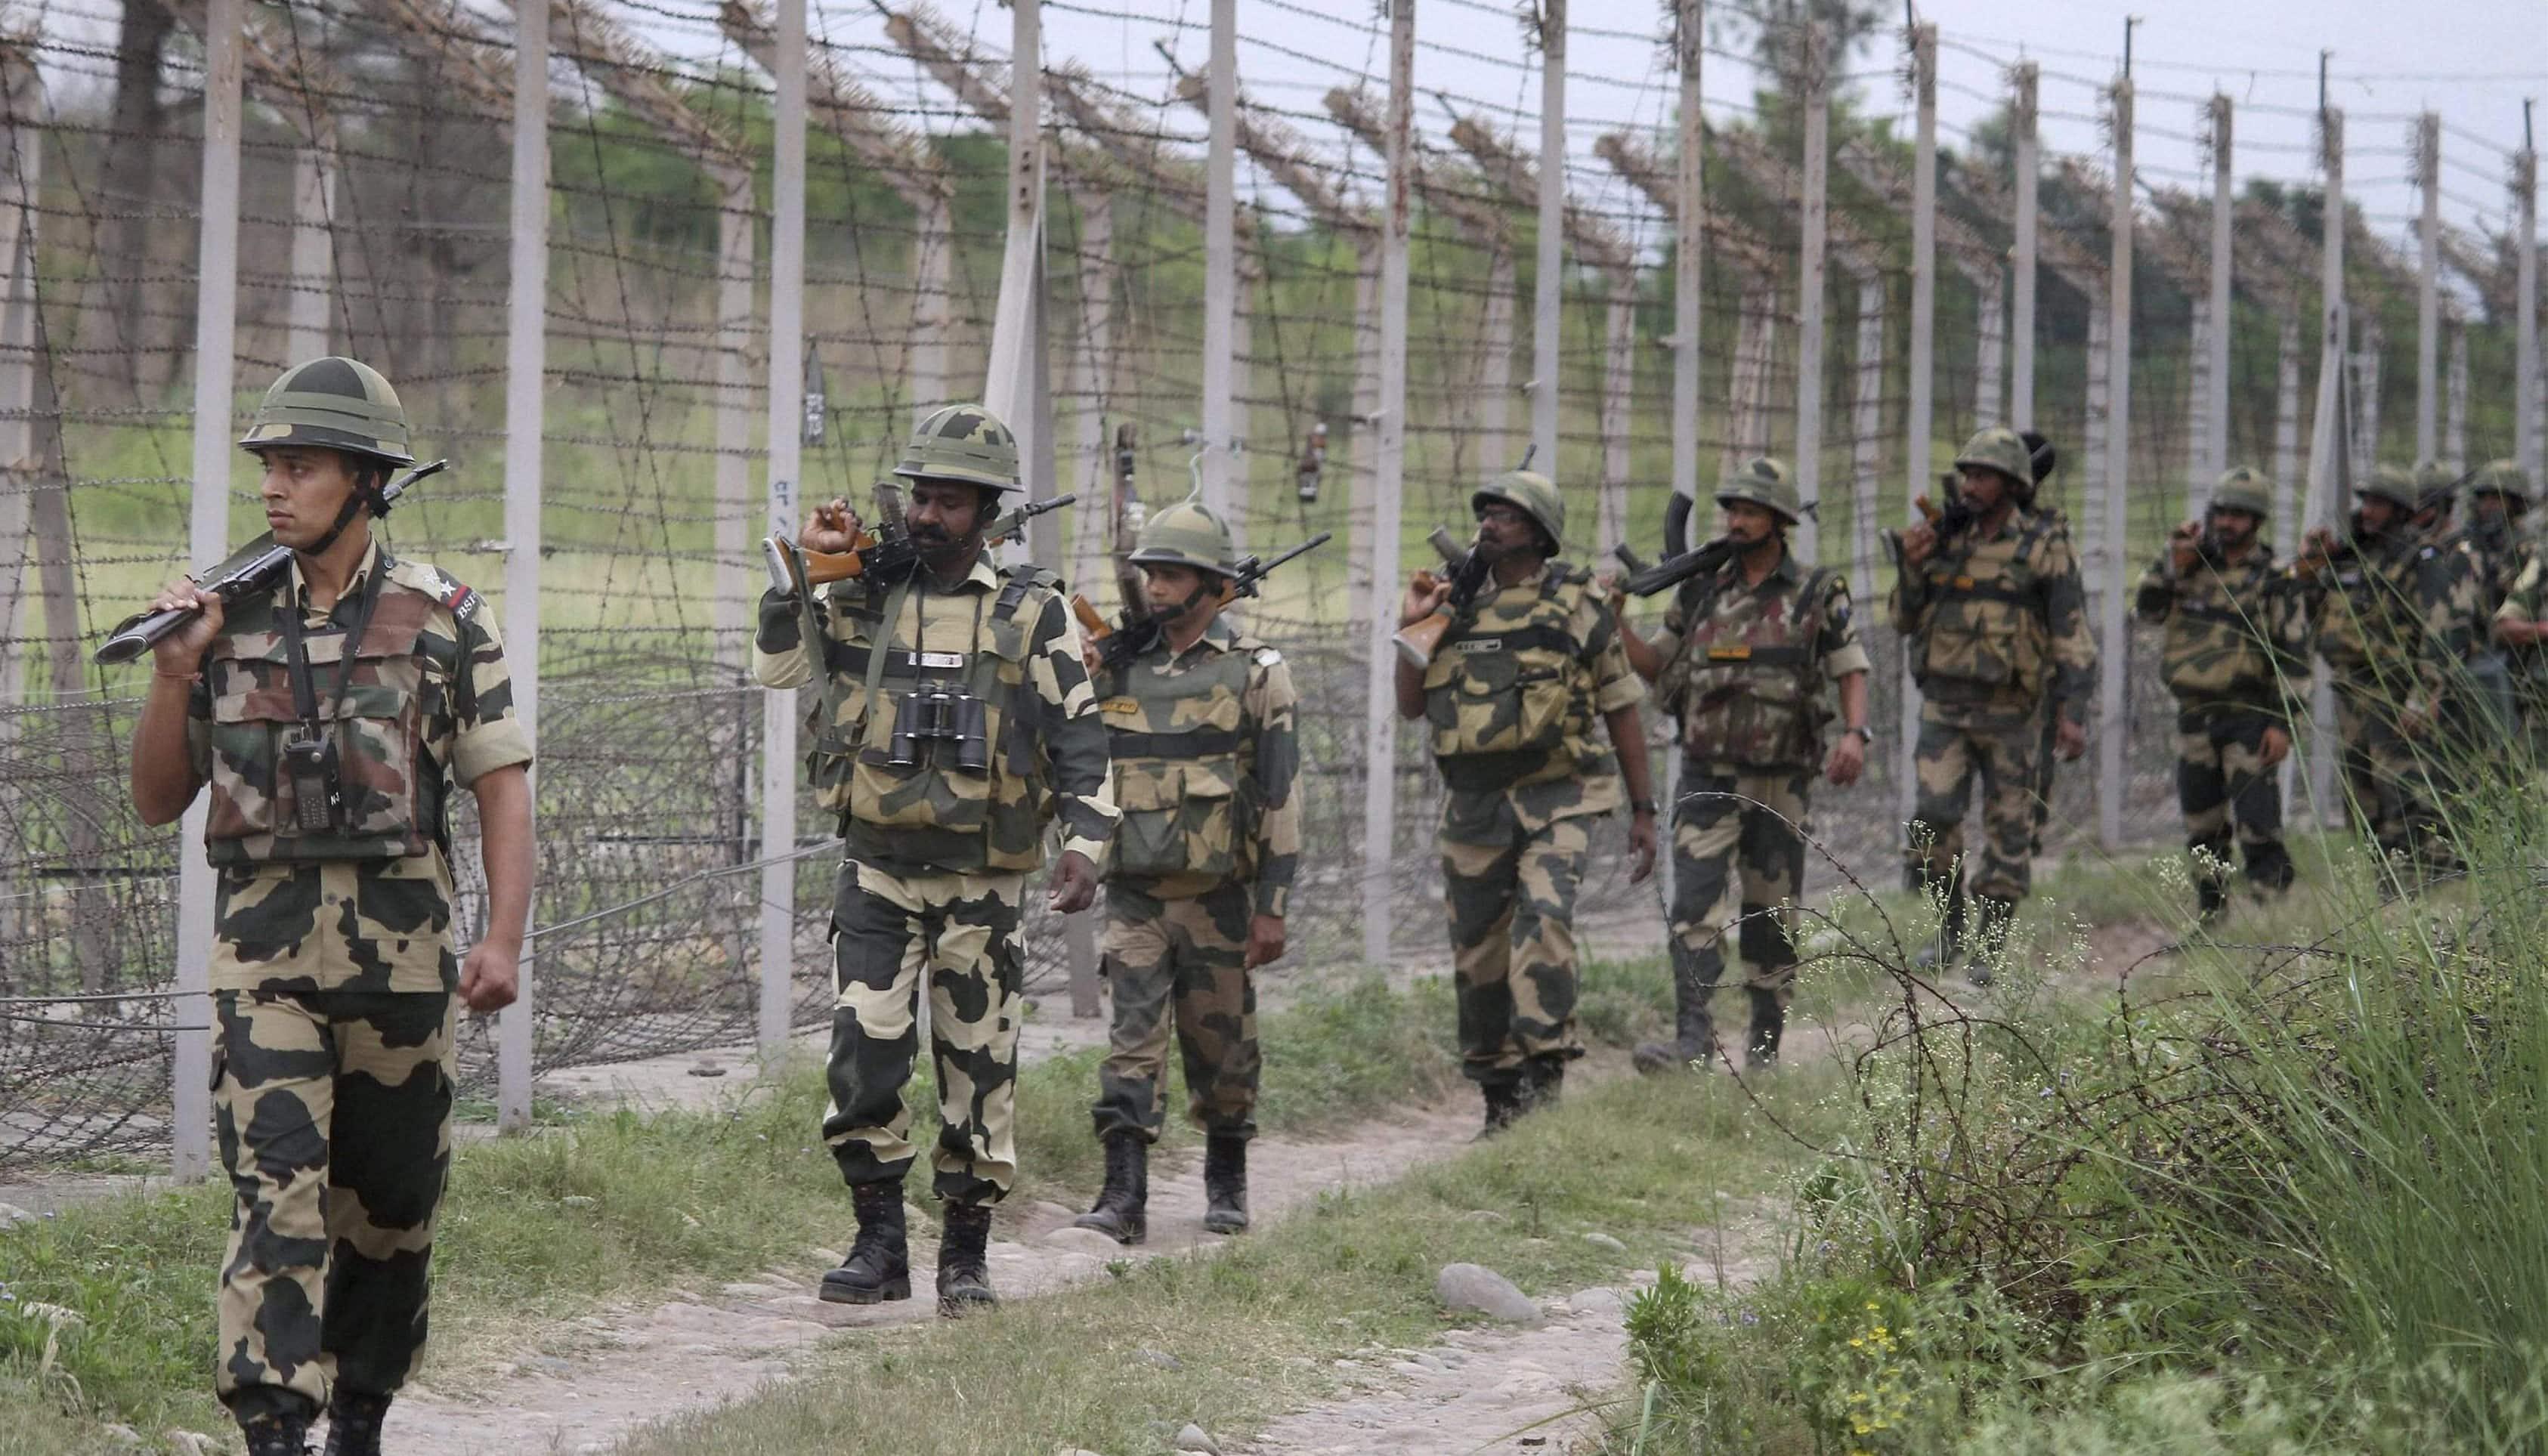 Rajnath Singh to inaugurate smart fence pilot project along India-Pakistan border